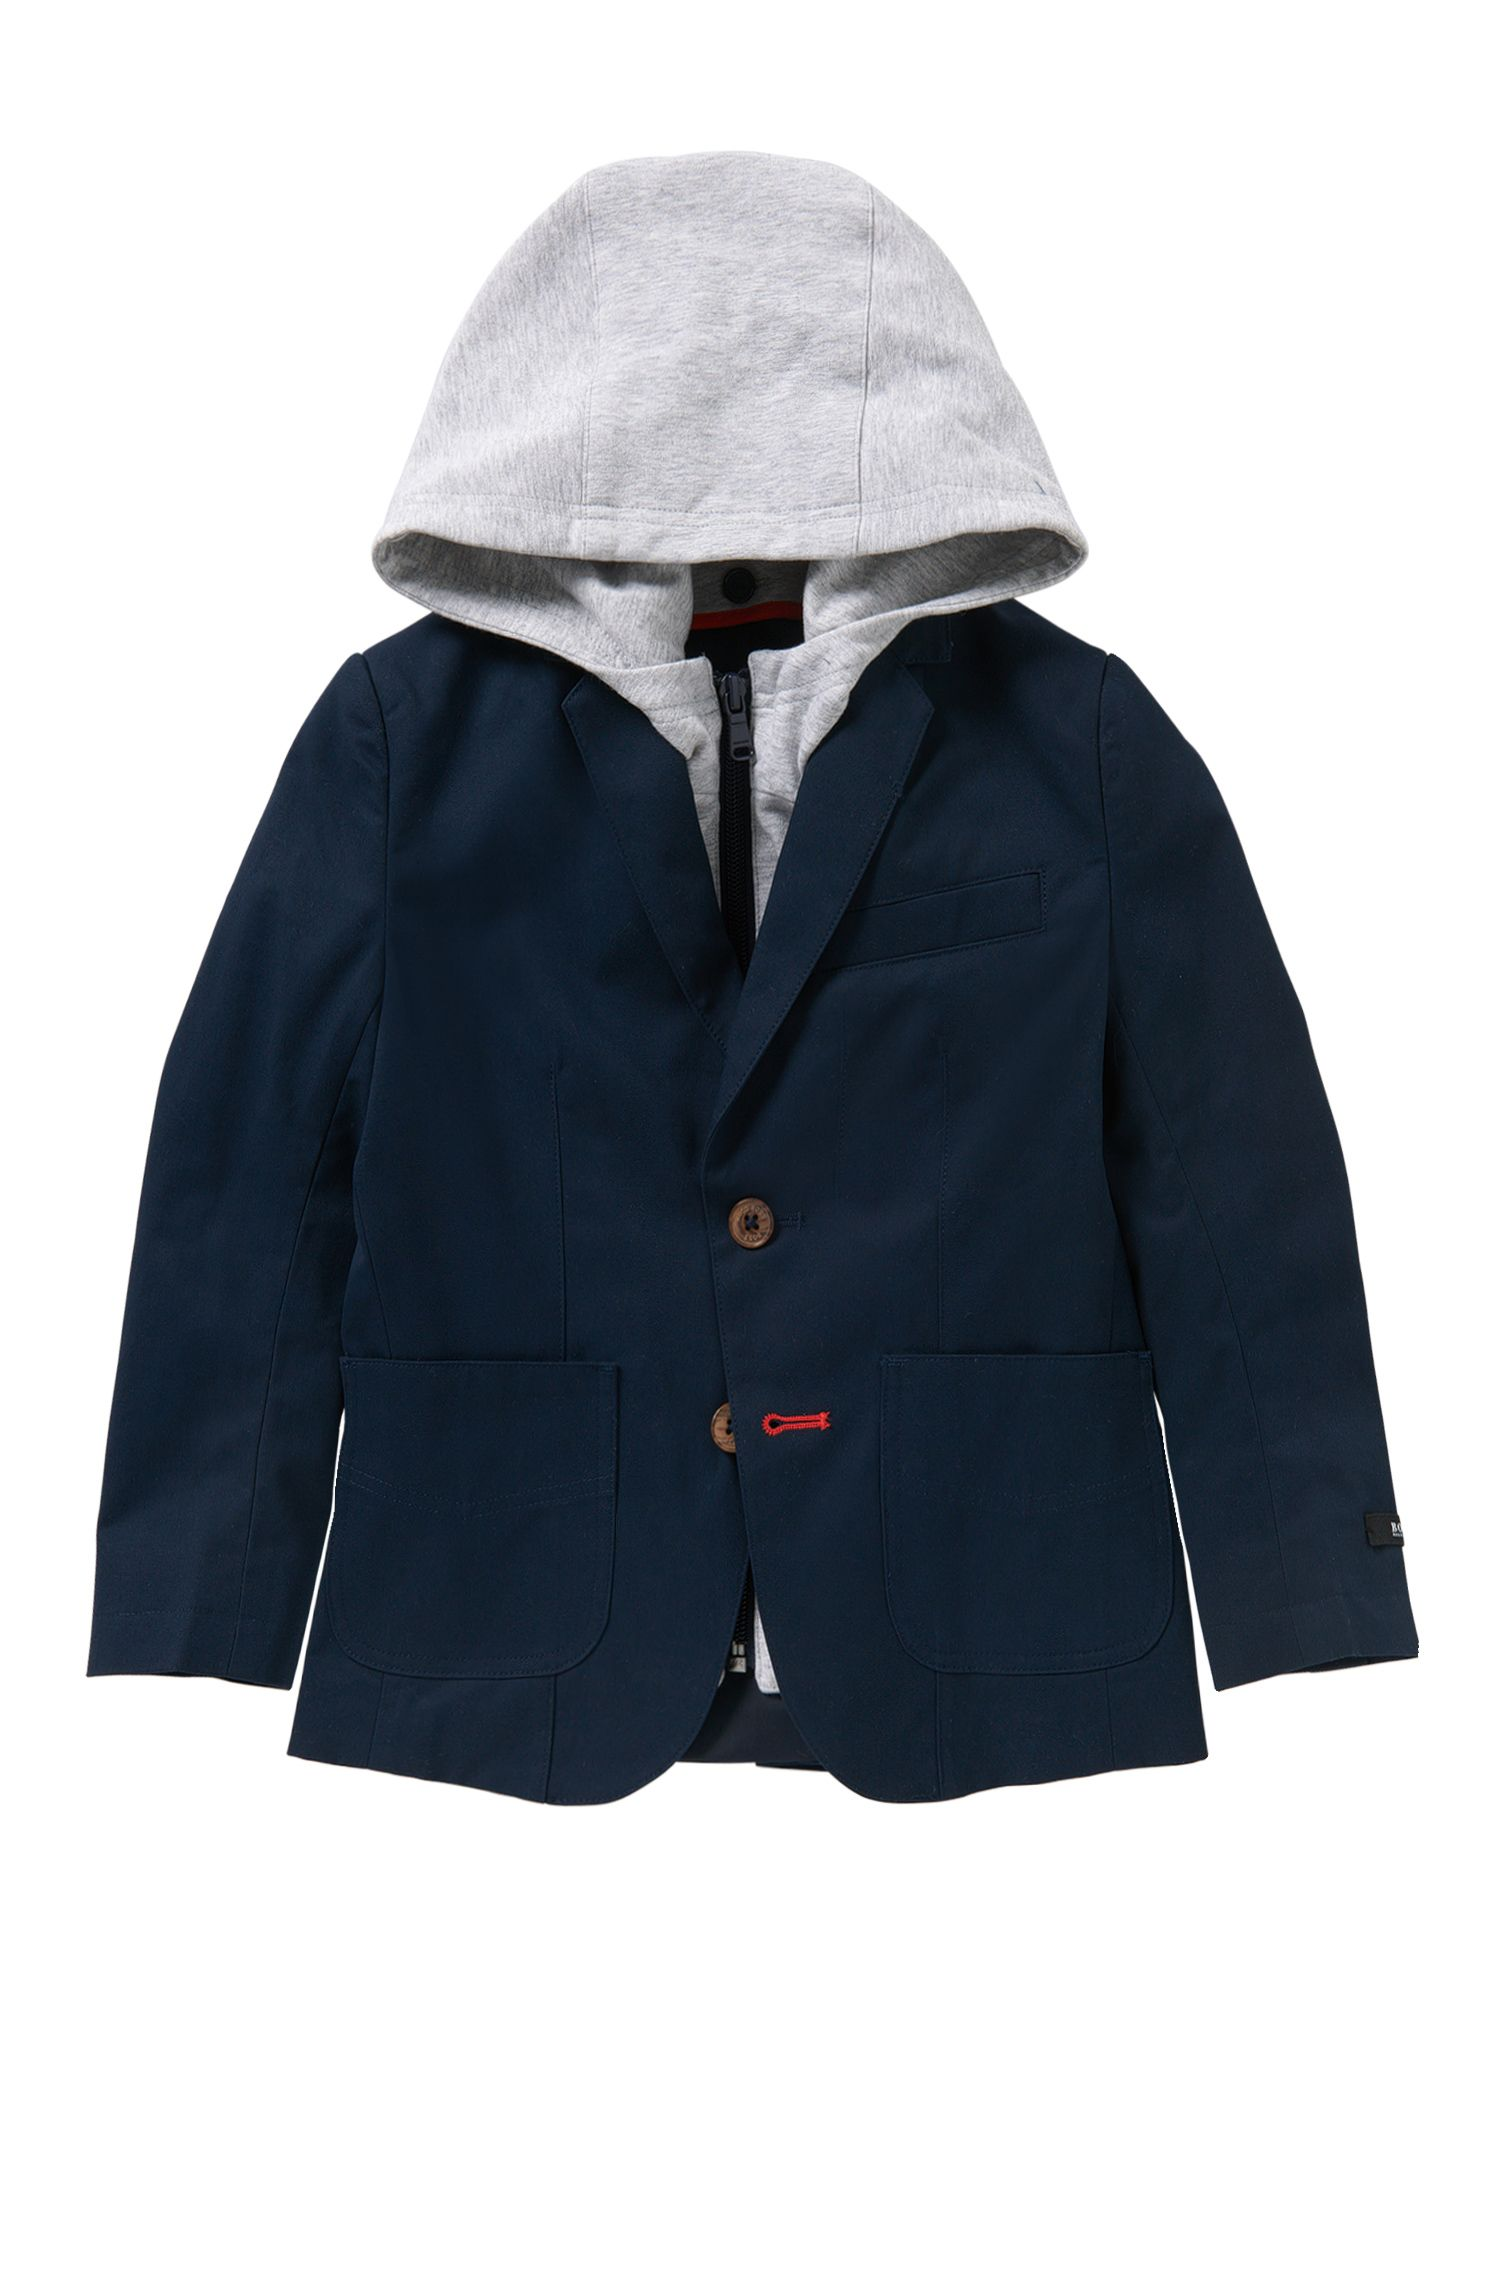 'J26276'   Boys Suit Jacket, Removable Hood